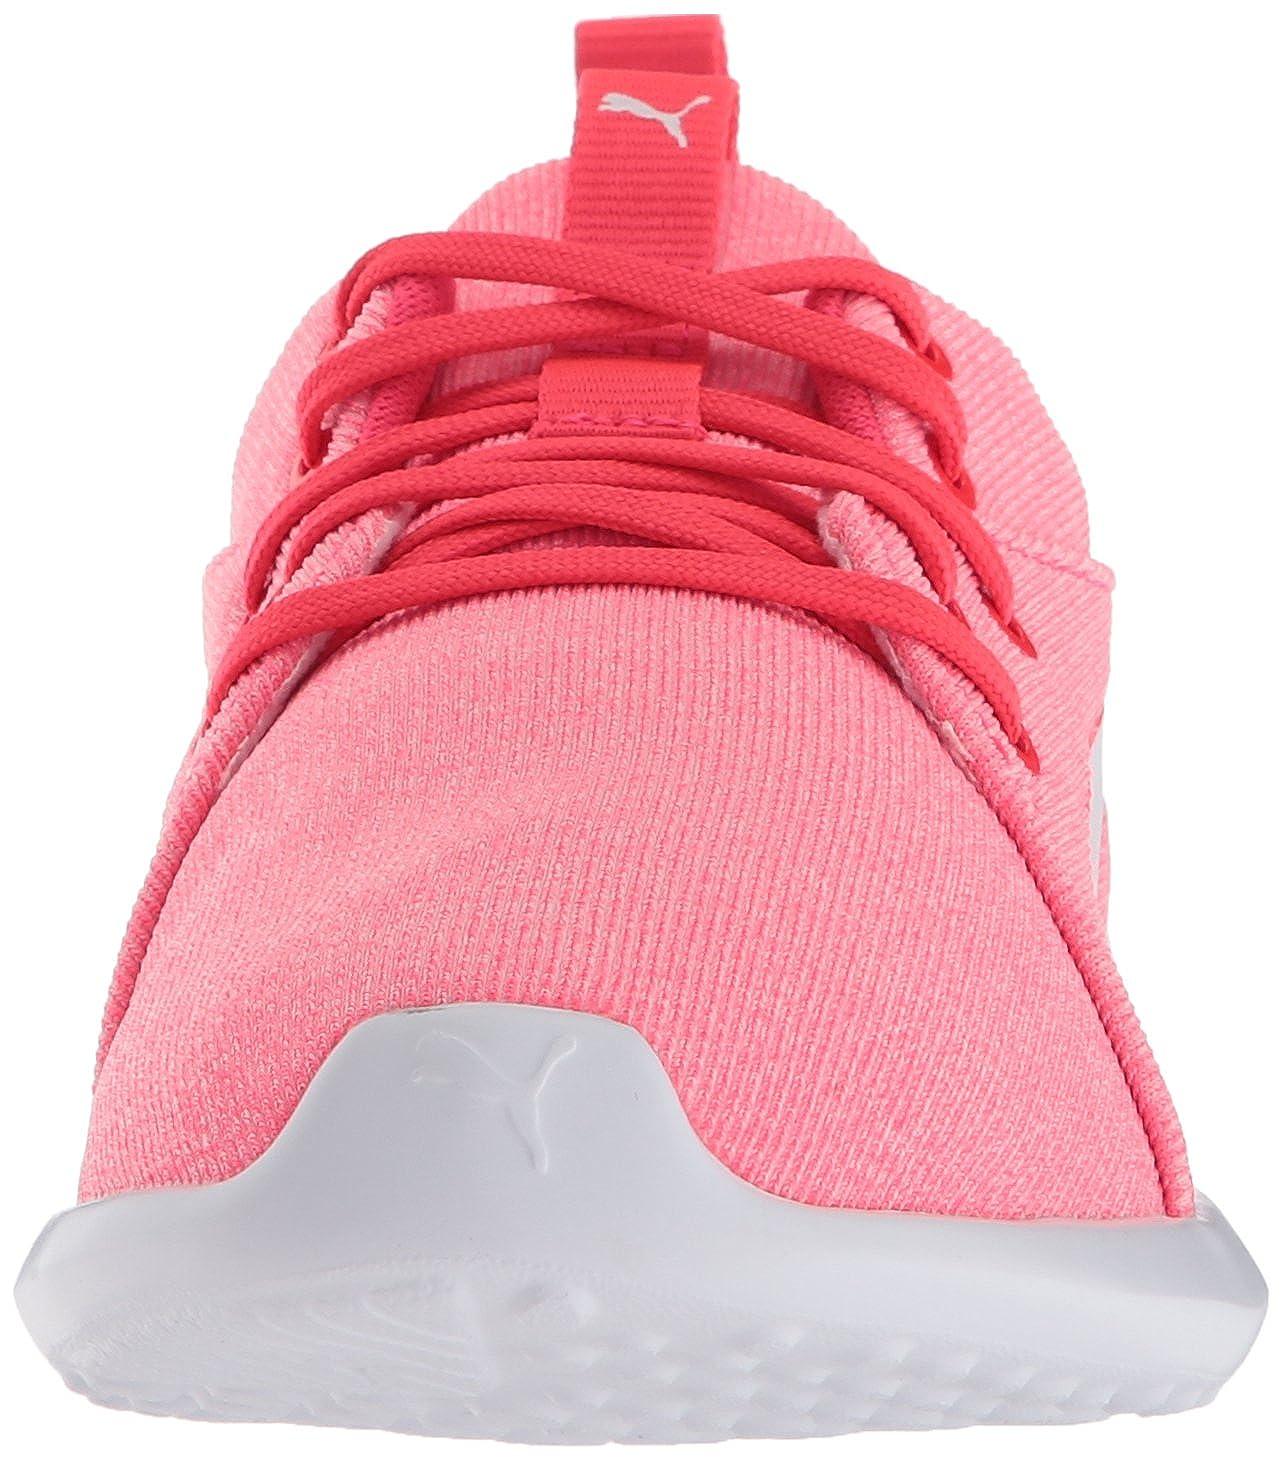 PUMA Damens's Carson 2 Wn Sneaker, Bright 8.5 Plasma Weiß, 8.5 Bright M US - 1a2203